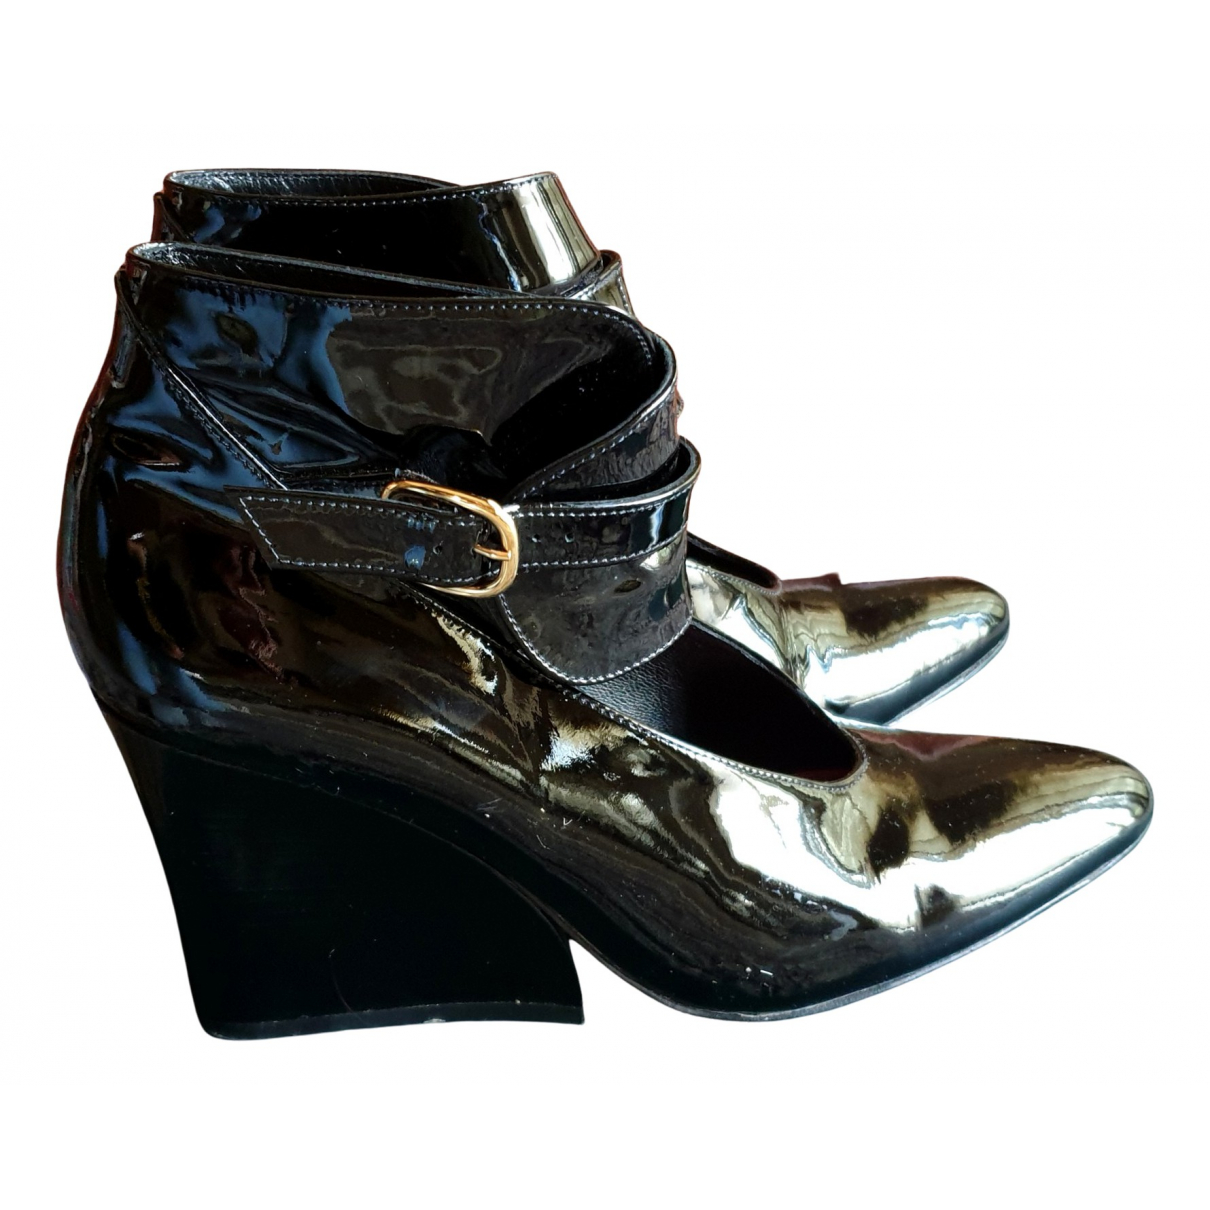 Robert Clergerie N Black Patent leather Heels for Women 40 EU